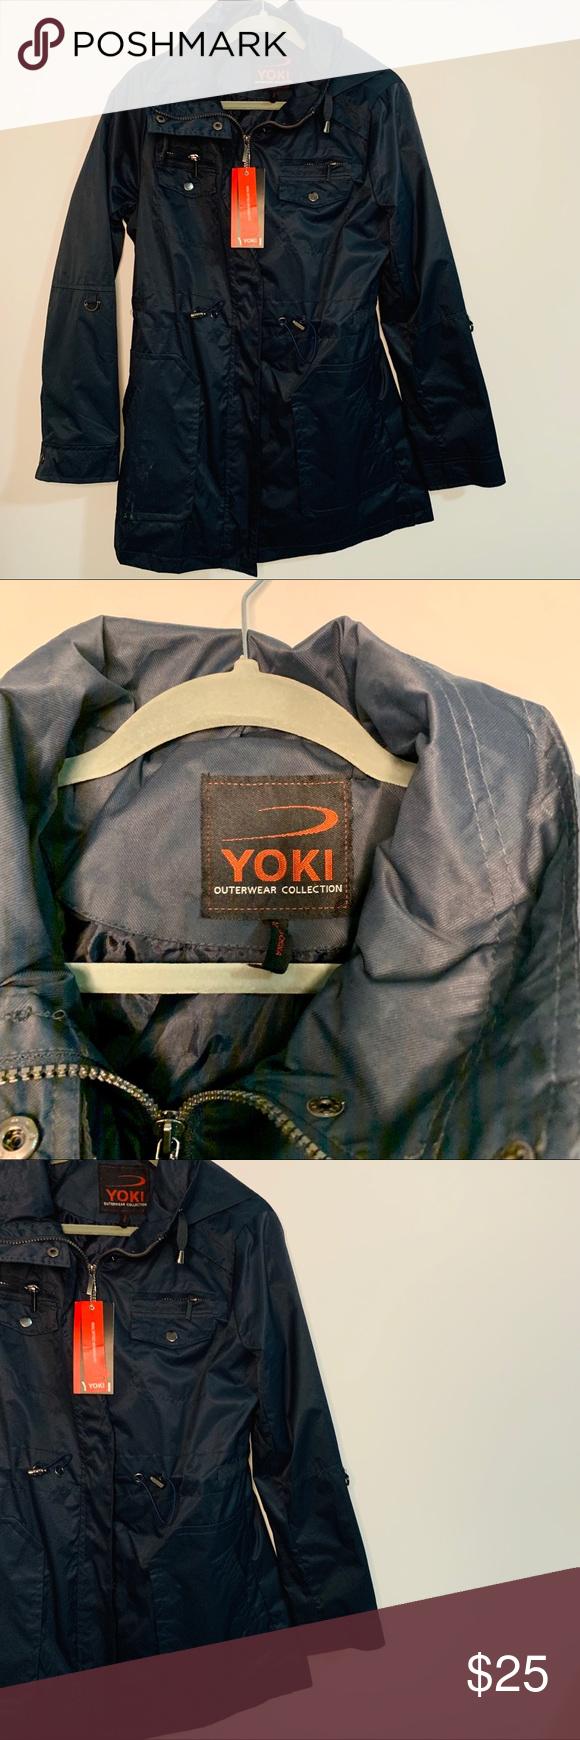 Yoki Navy Outerwear Jacket Outerwear Jackets Jackets Outerwear [ 1740 x 580 Pixel ]